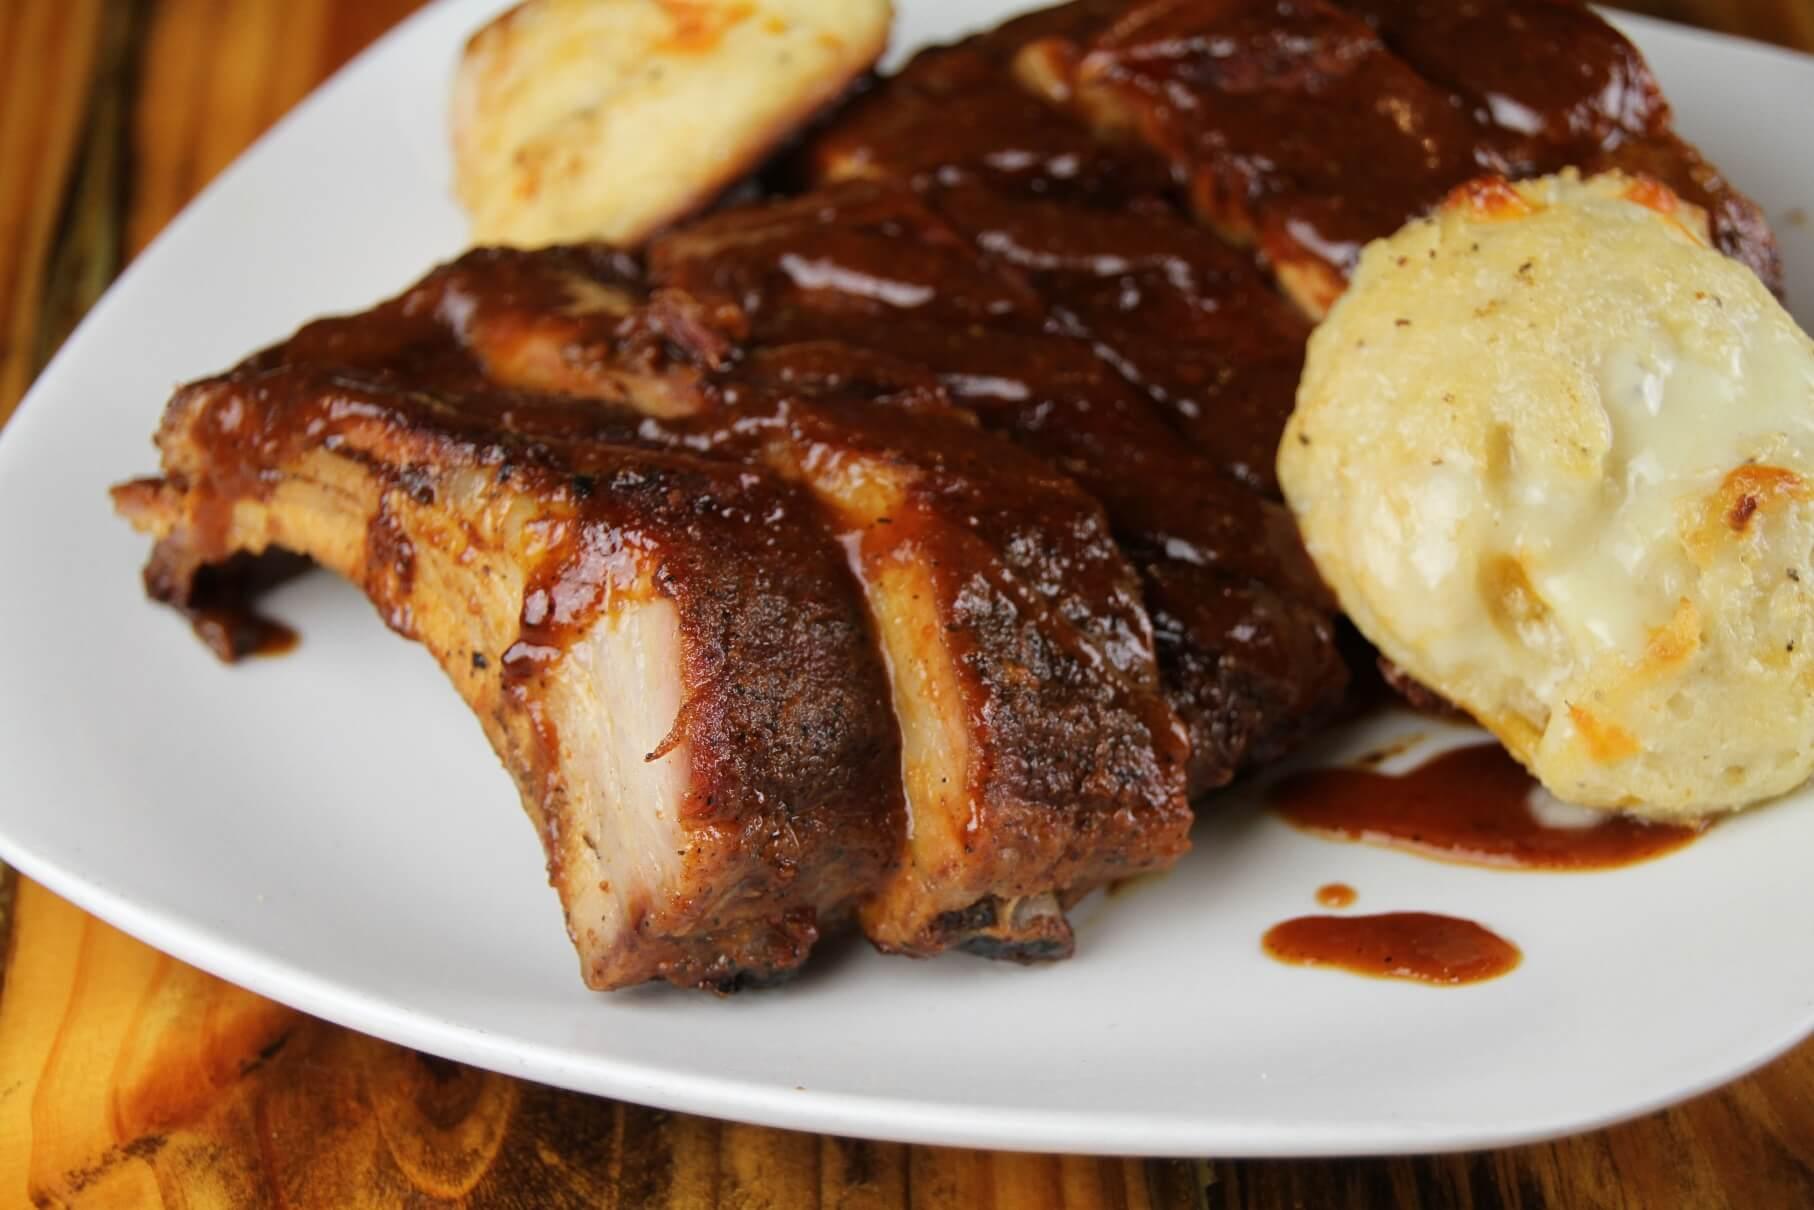 Buffalo-style ribs